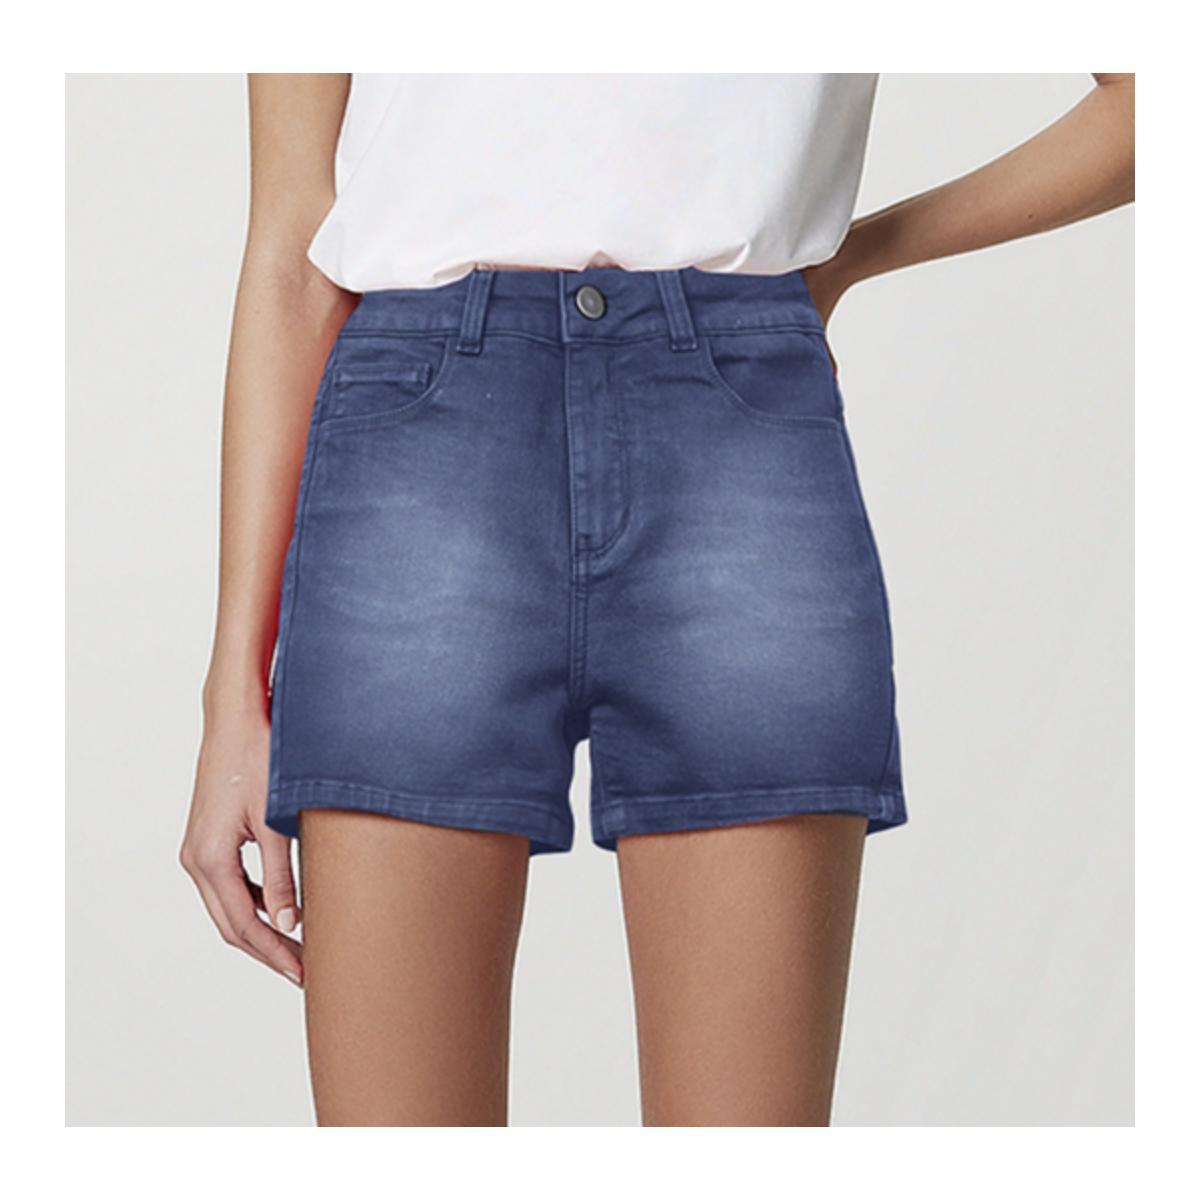 Short Feminino Hering Hb74 1esn  Jeans